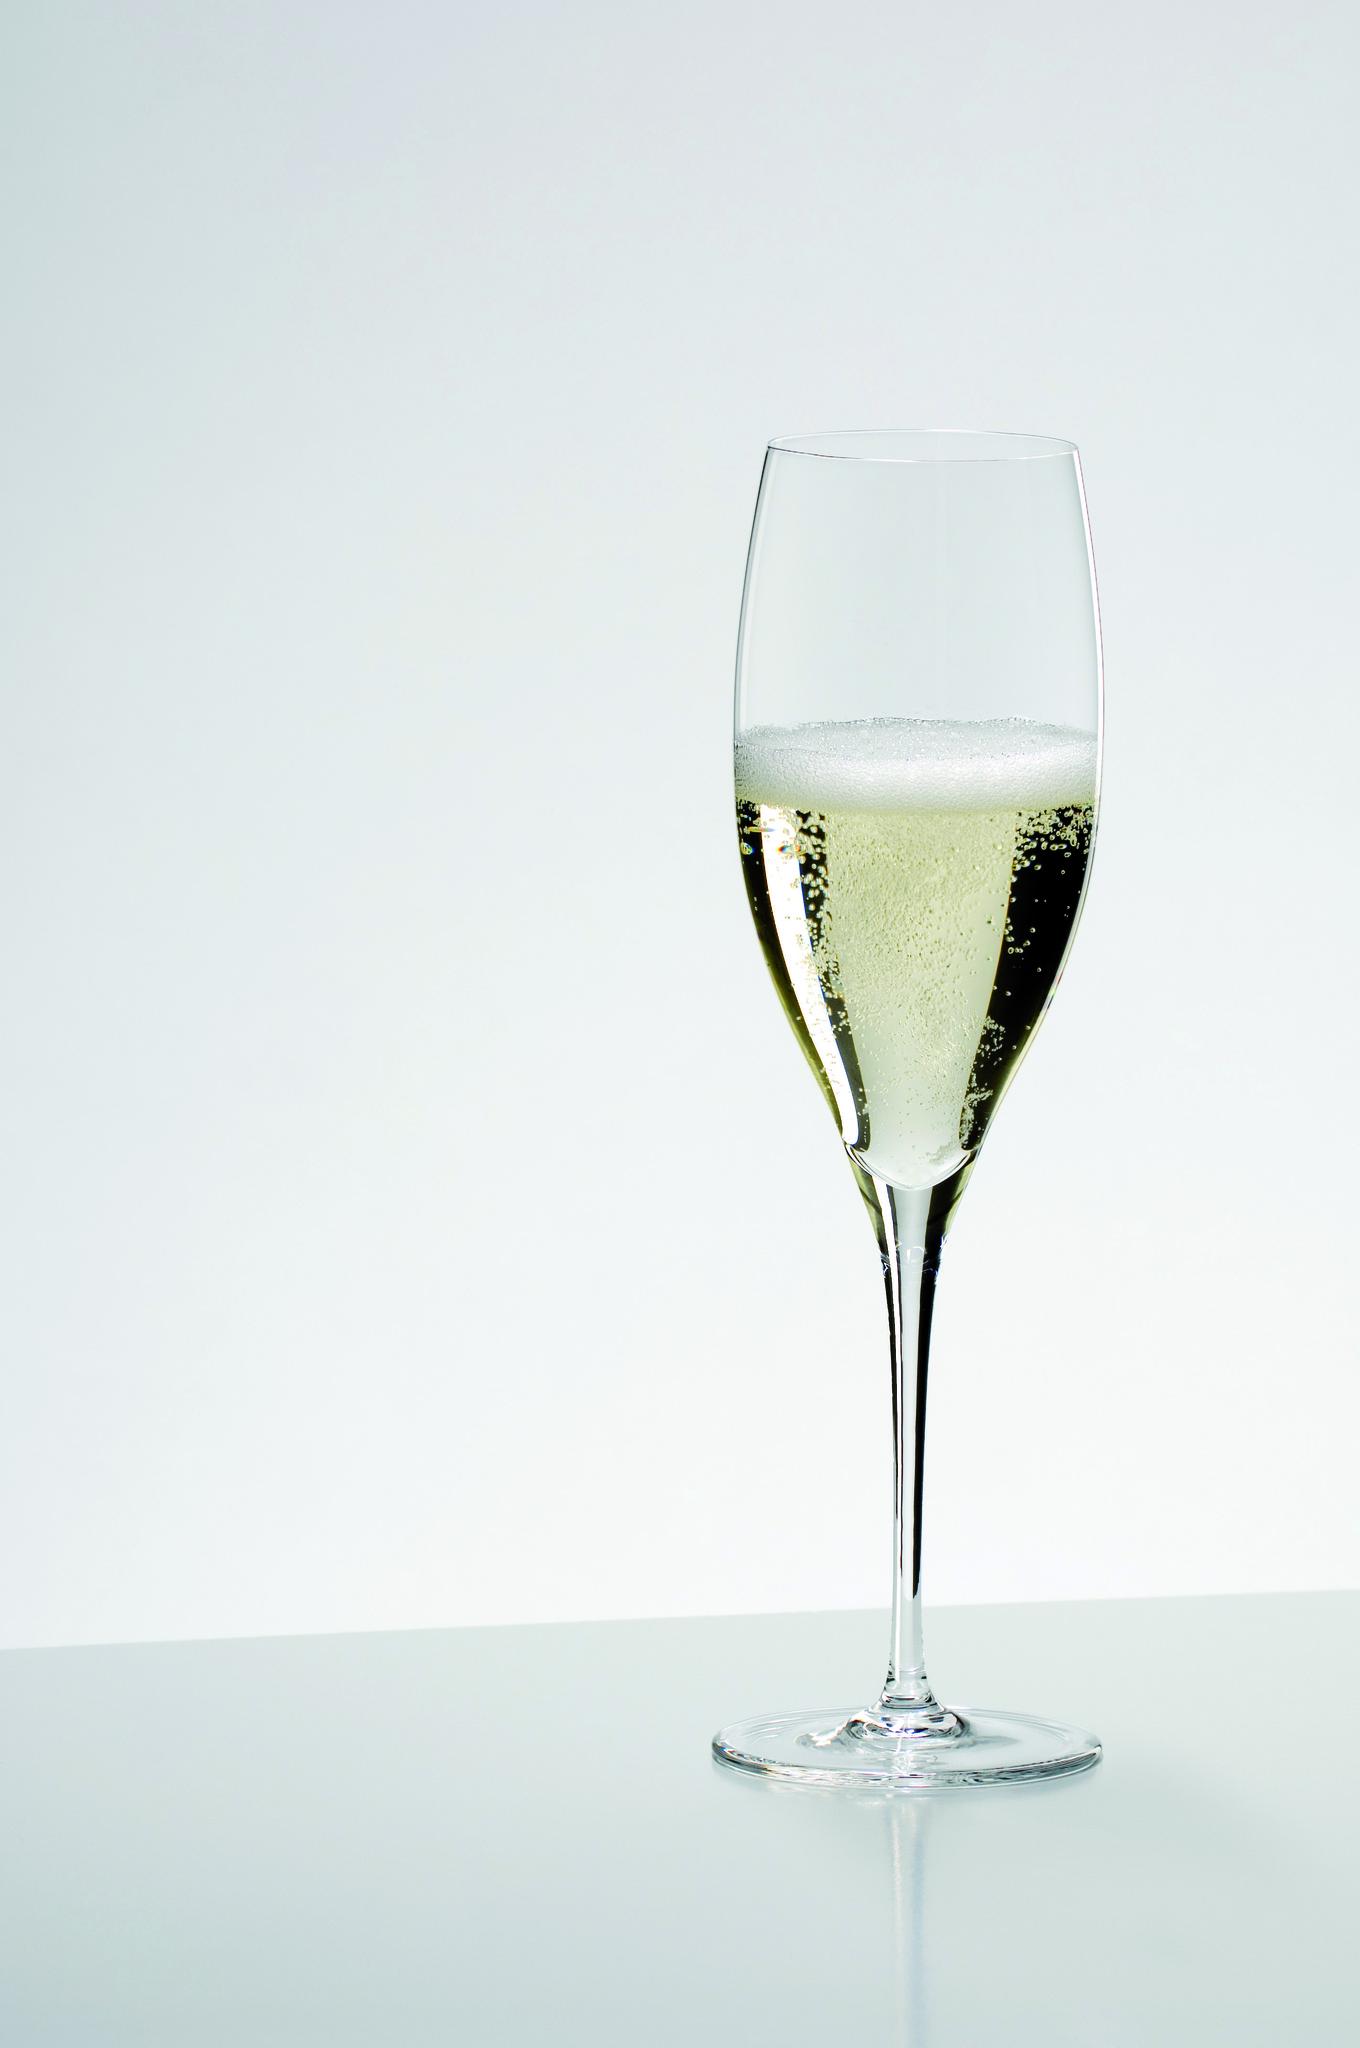 Бокалы Бокал для шампанского 330мл Riedel Sommeliers Vintage Champagne bokal-dlya-shampanskogo-330-ml-riedel-vintage-champagne-avstriya.jpg